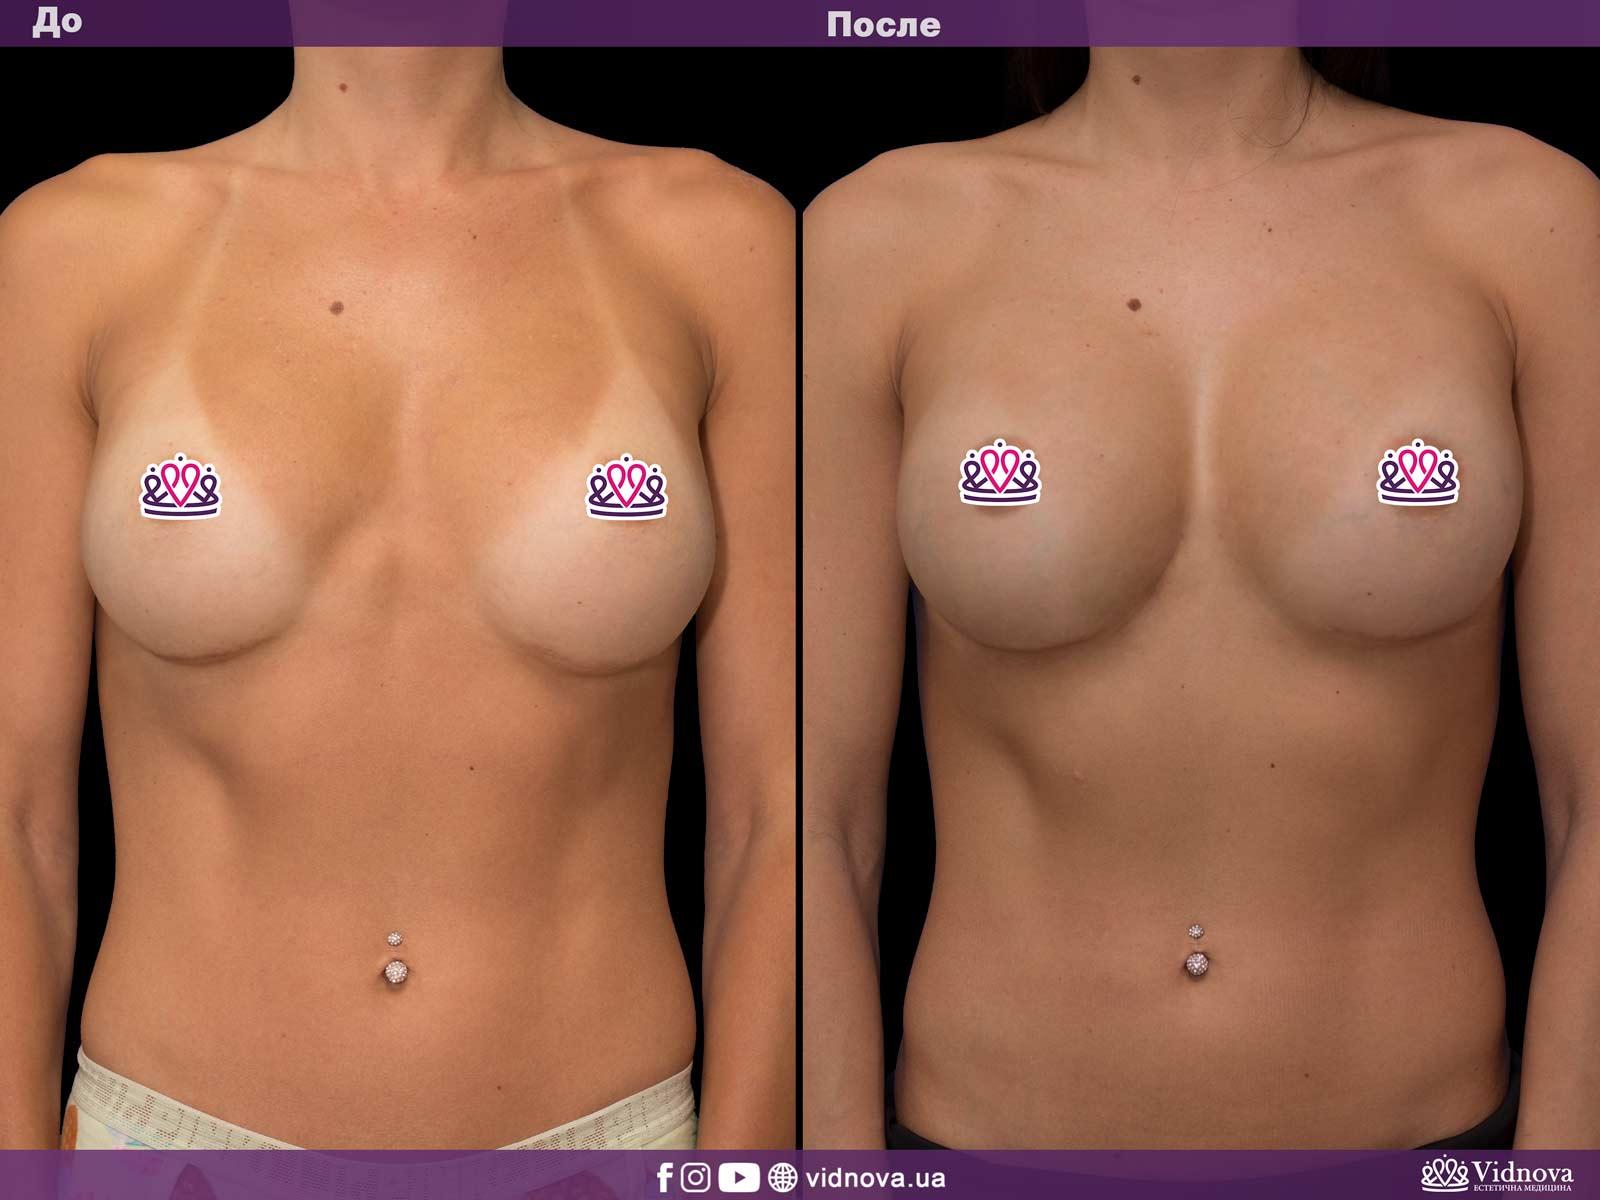 Увеличение груди: Фото ДО и ПОСЛЕ - Пример №27-1 - Клиника Vidnova